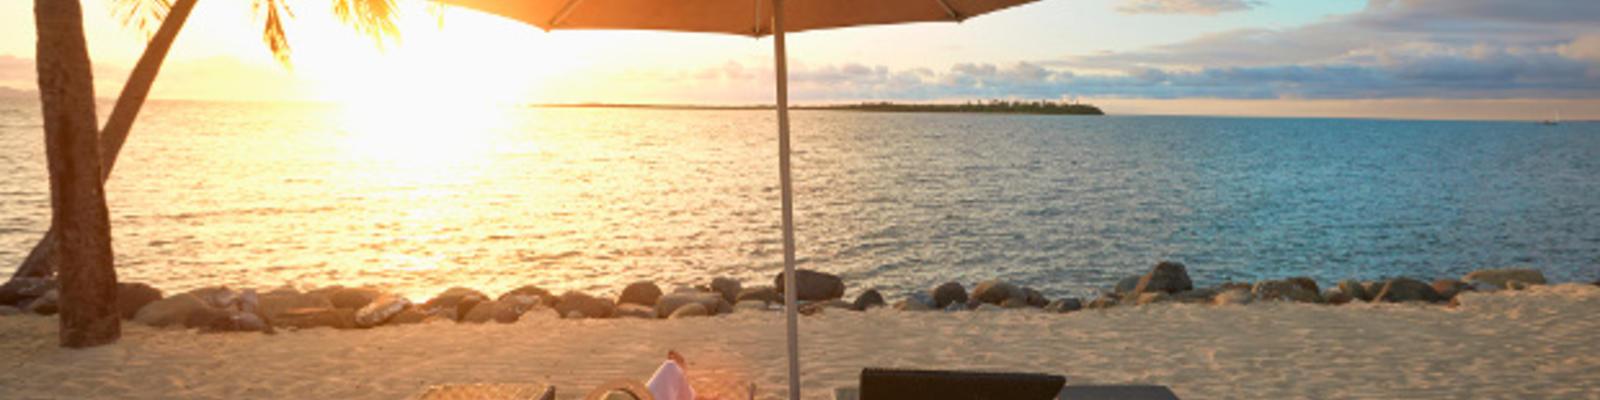 Loungers on the Fijian beach at sunset